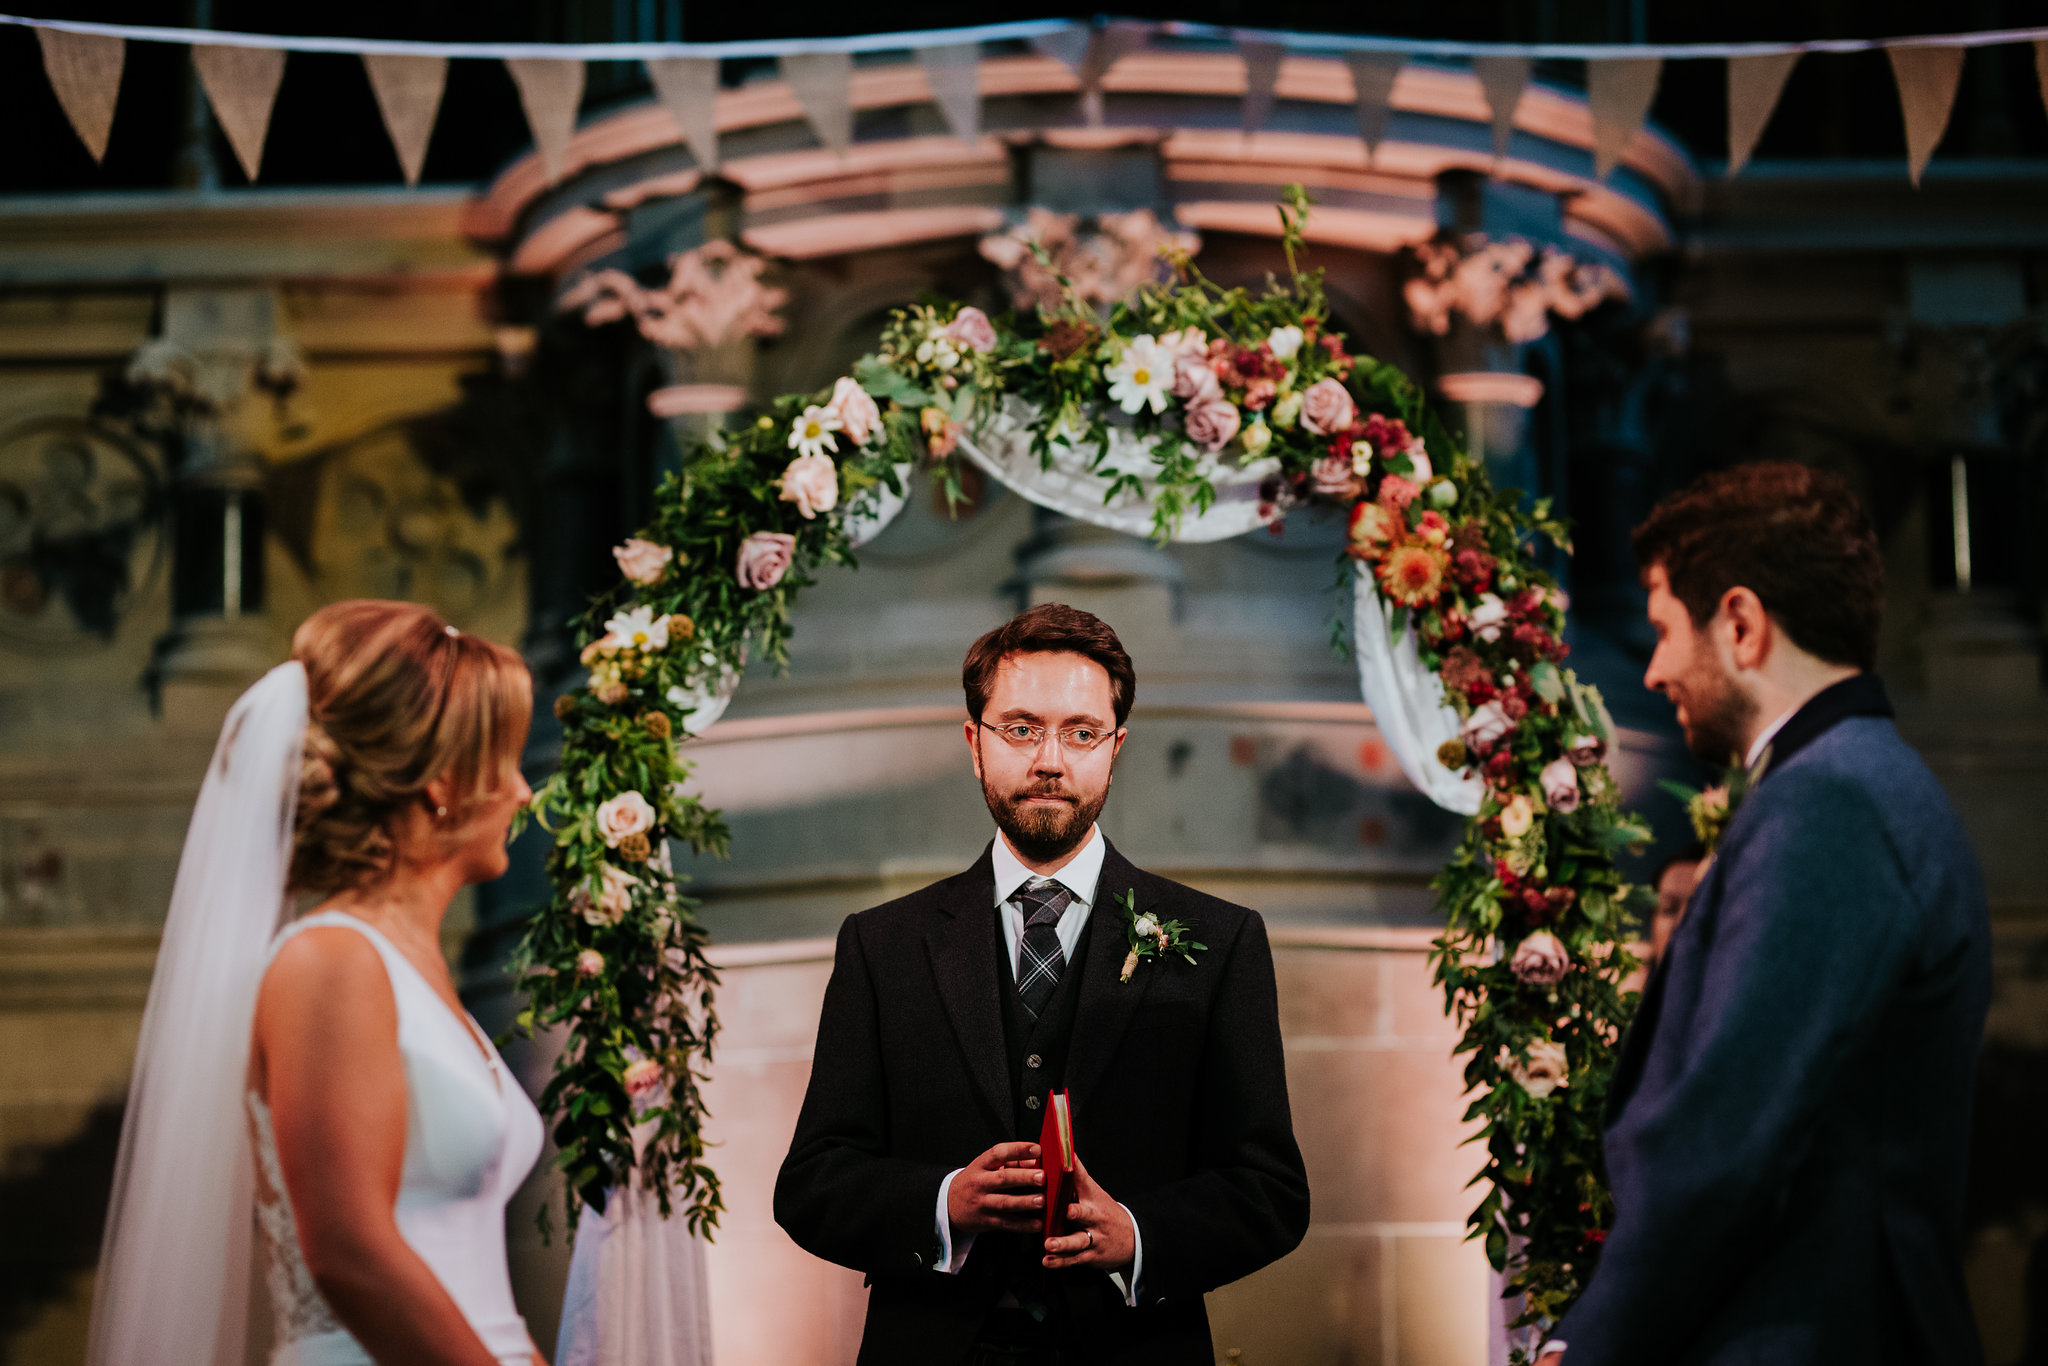 Cottiers wedding lavender and rose wedding florists scotland7.jpg